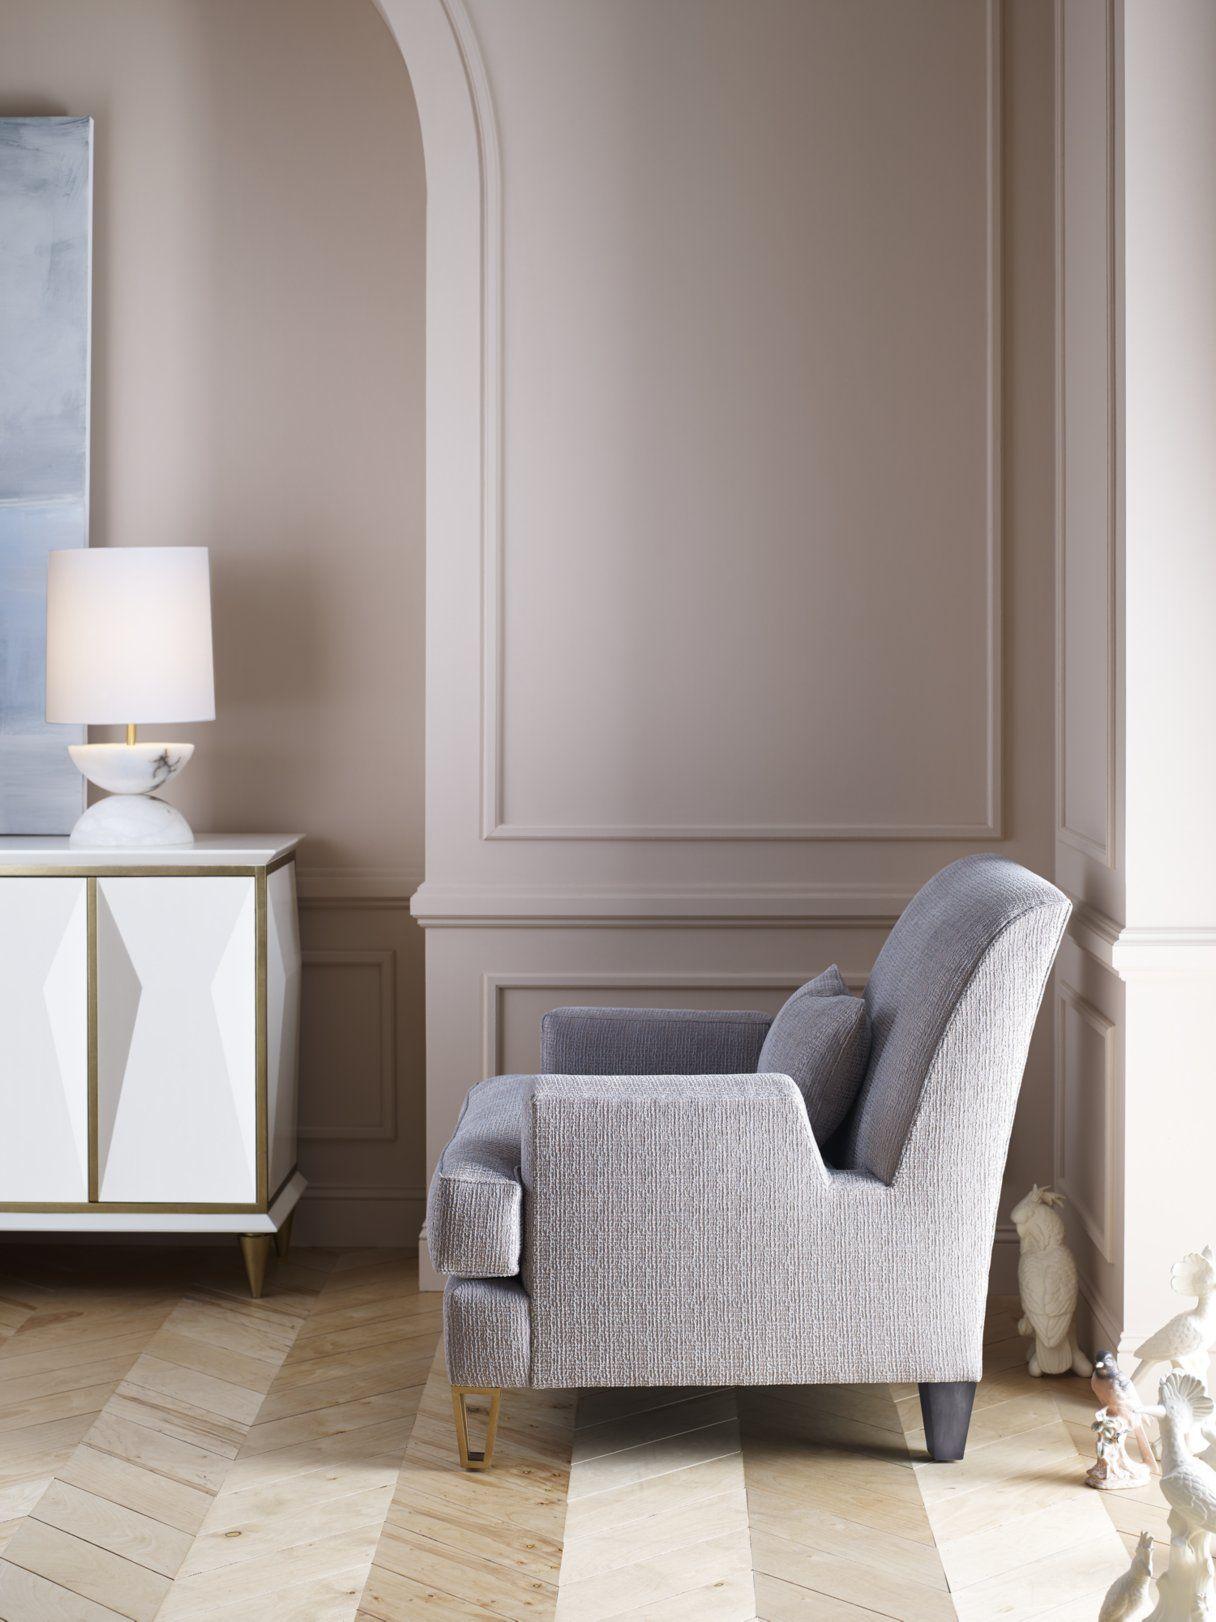 Jean Louis Deniot Baker Furniture Parisian Design With Images